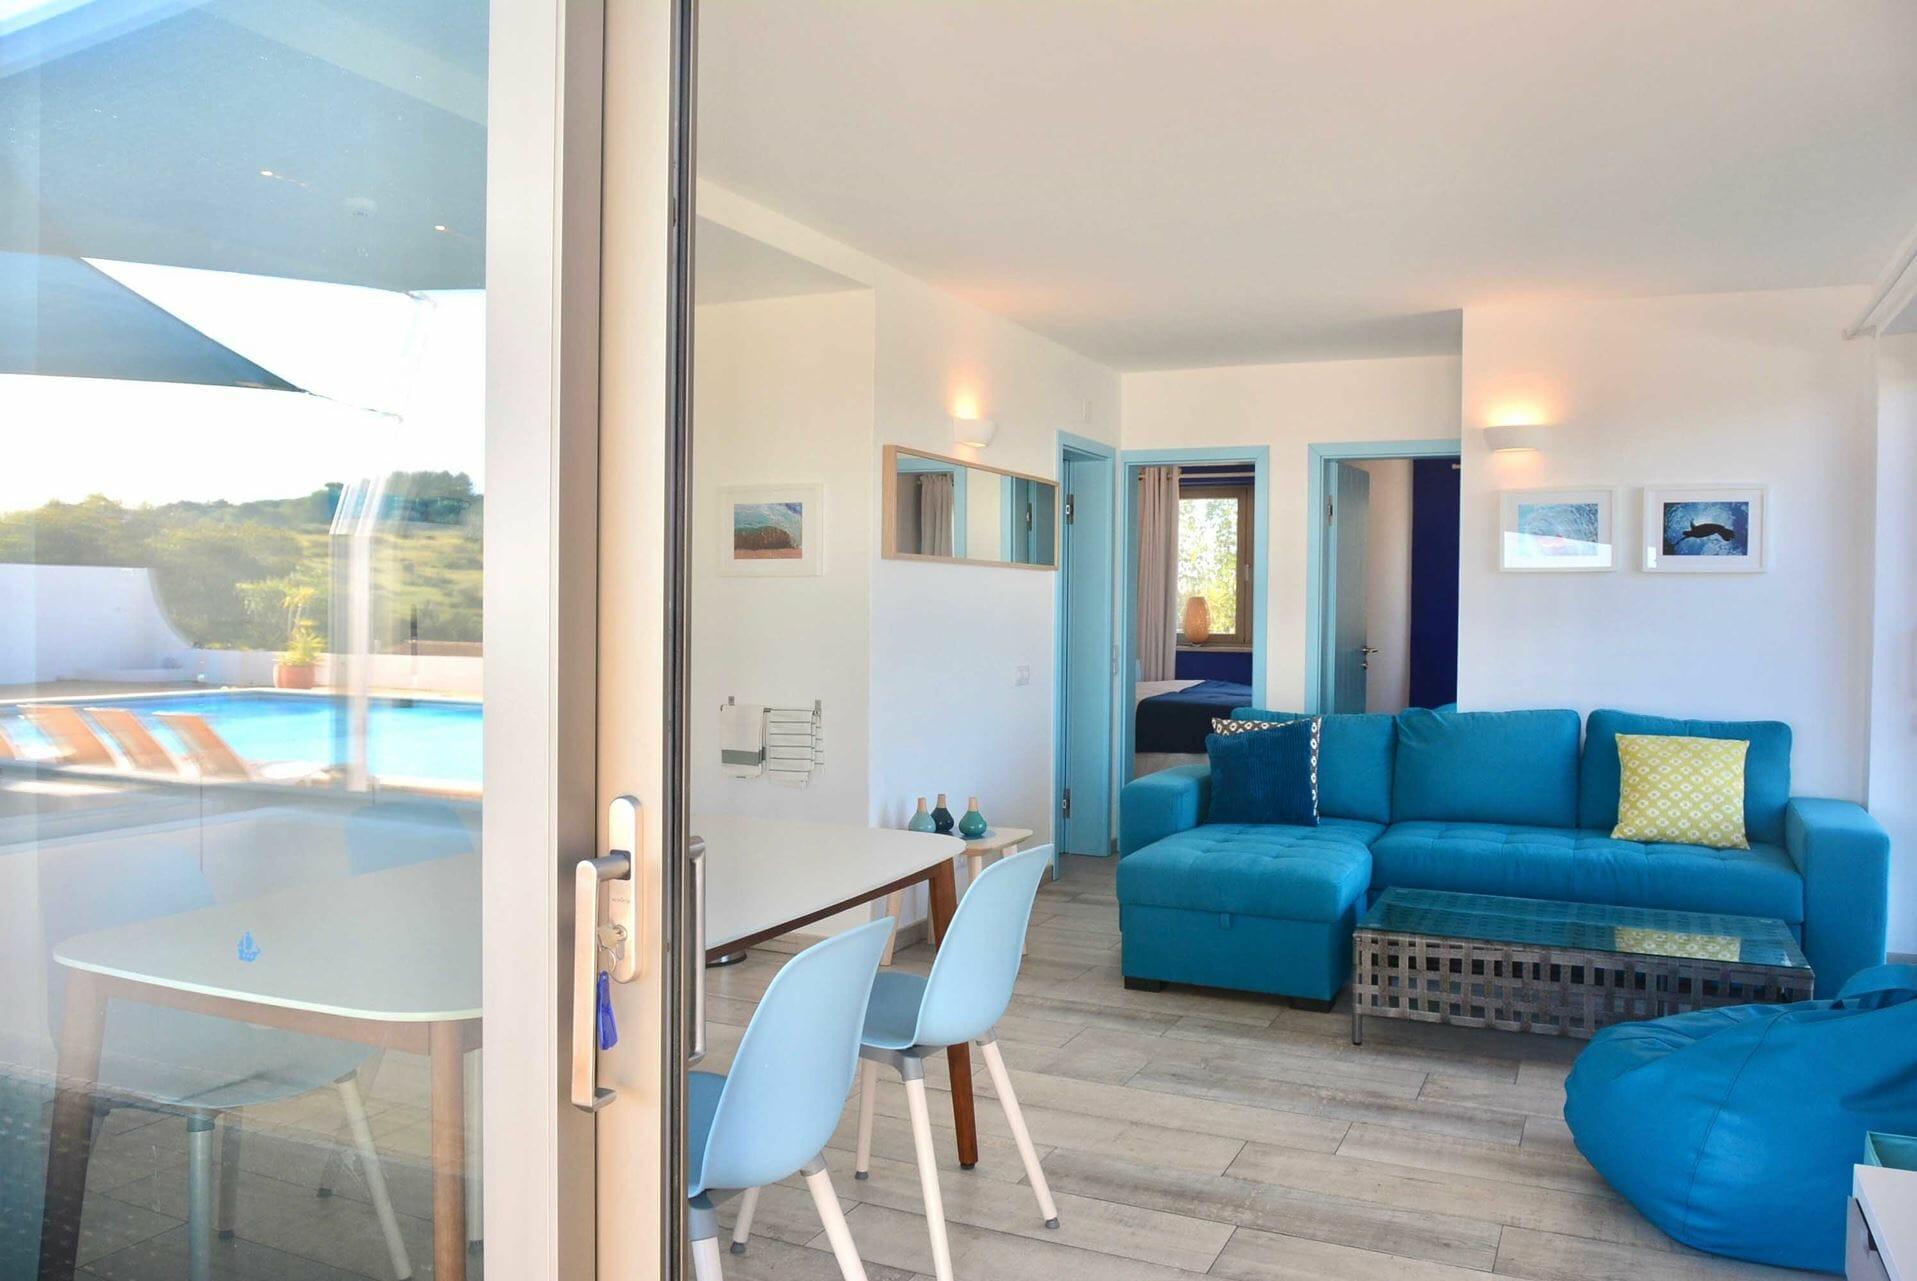 Oceano 2 Bedroom Apartment (1) Ocean Blue Portugal Active Holidays Algarve